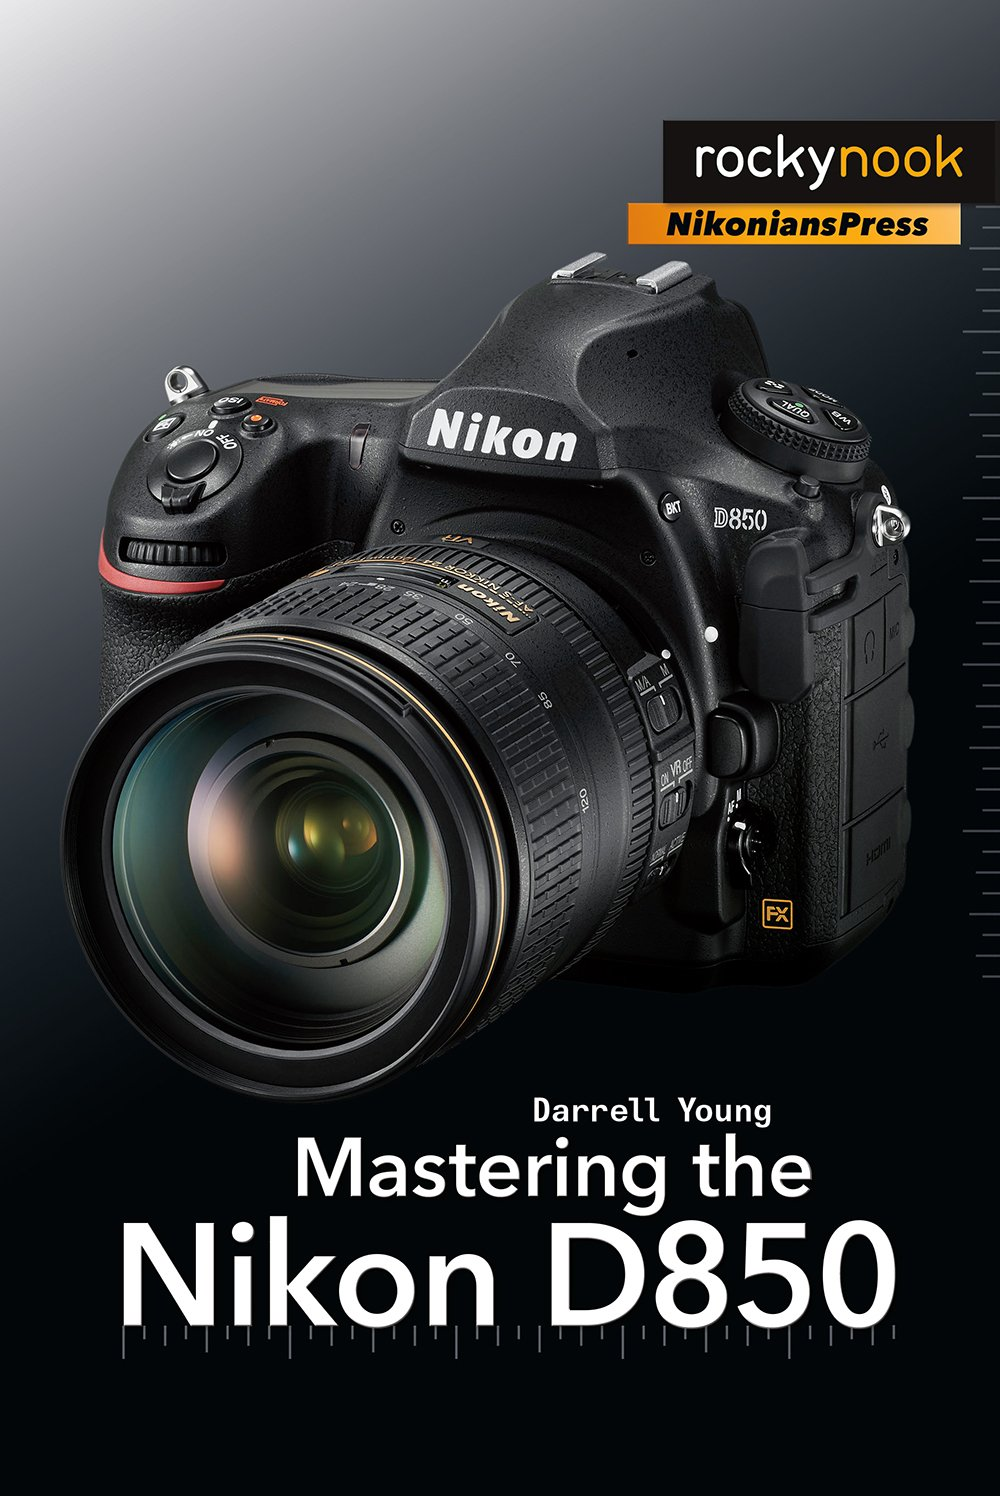 Mastering the Nikon D850: Darrell Young: 9781681983707